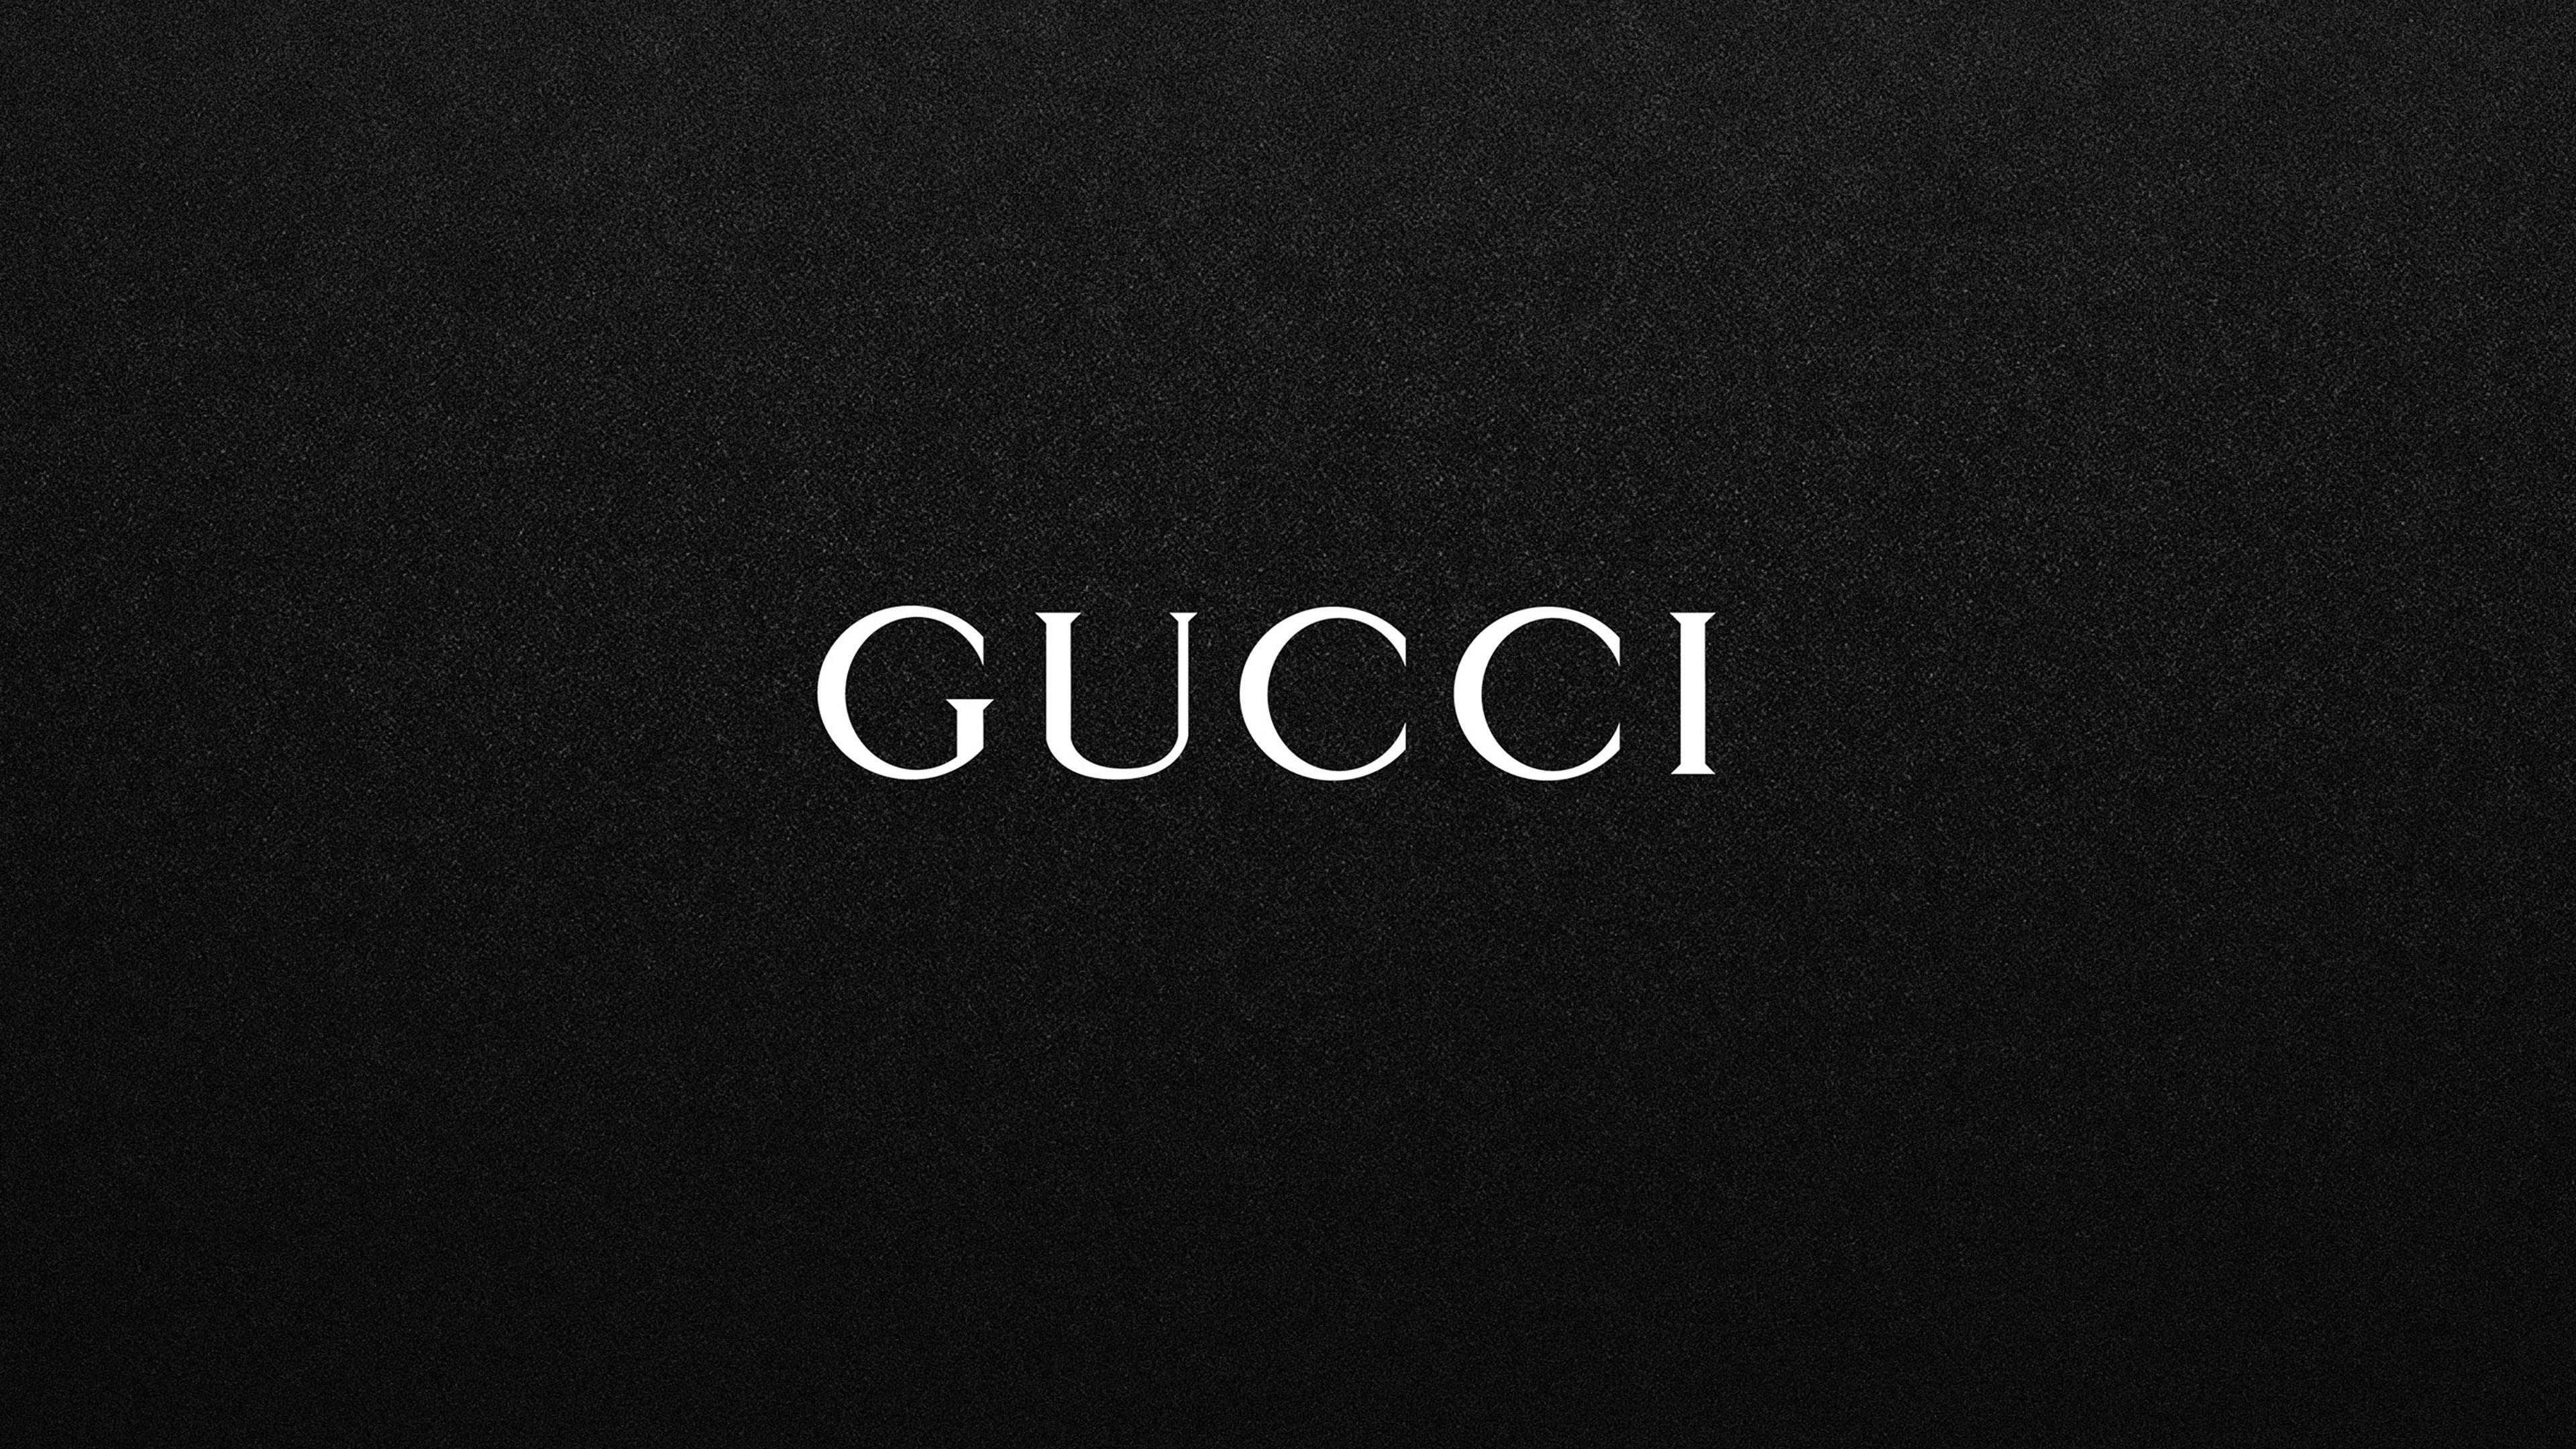 Gucci Logo Wallpapers HD 3840x2160